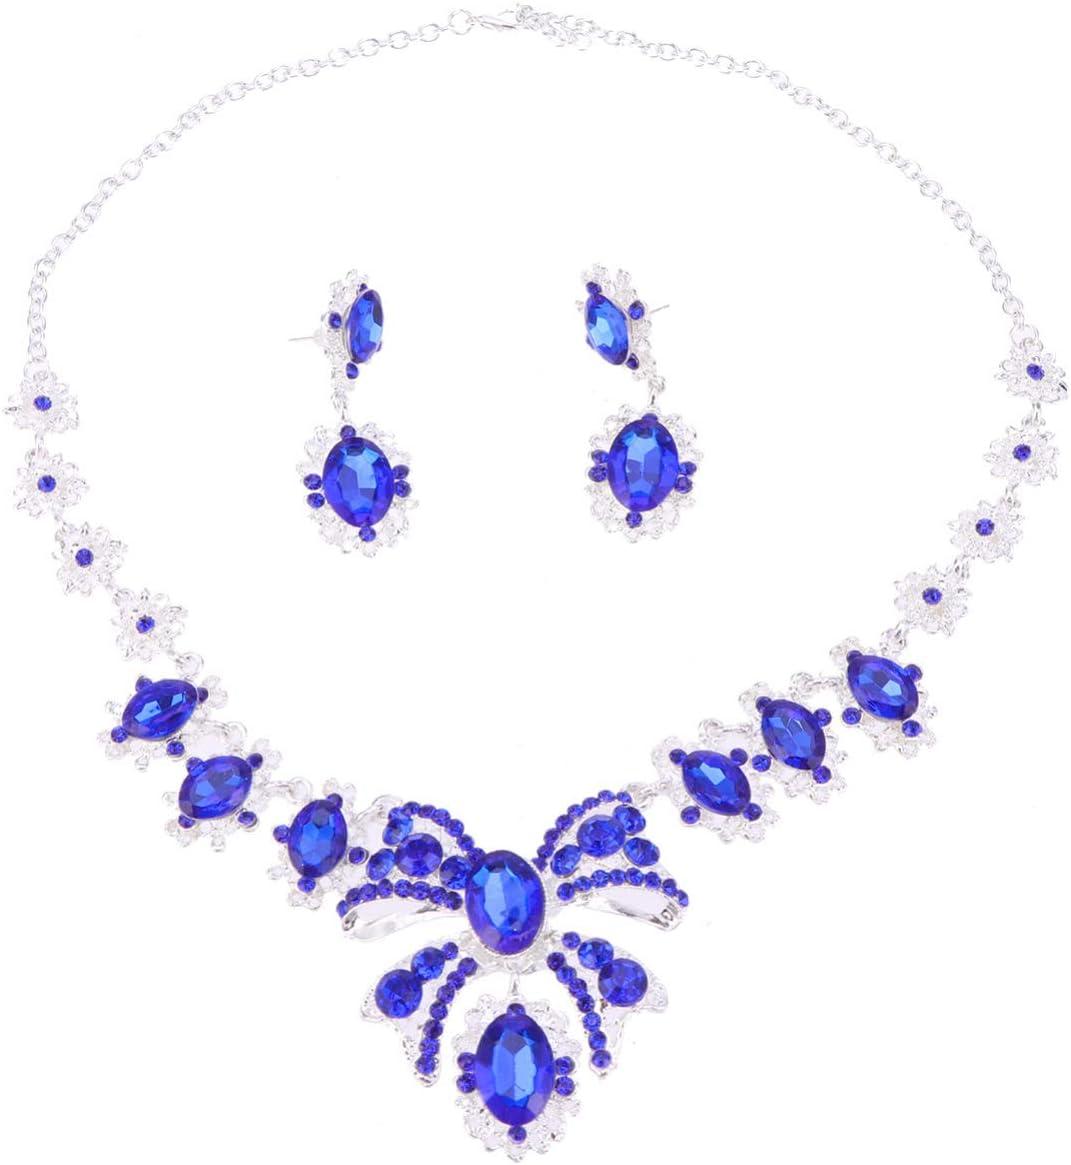 Happyyami Portland Mall 1 Set Rhinestone Necklace Eardrop Pendant Limited Special Price Brid Crystal